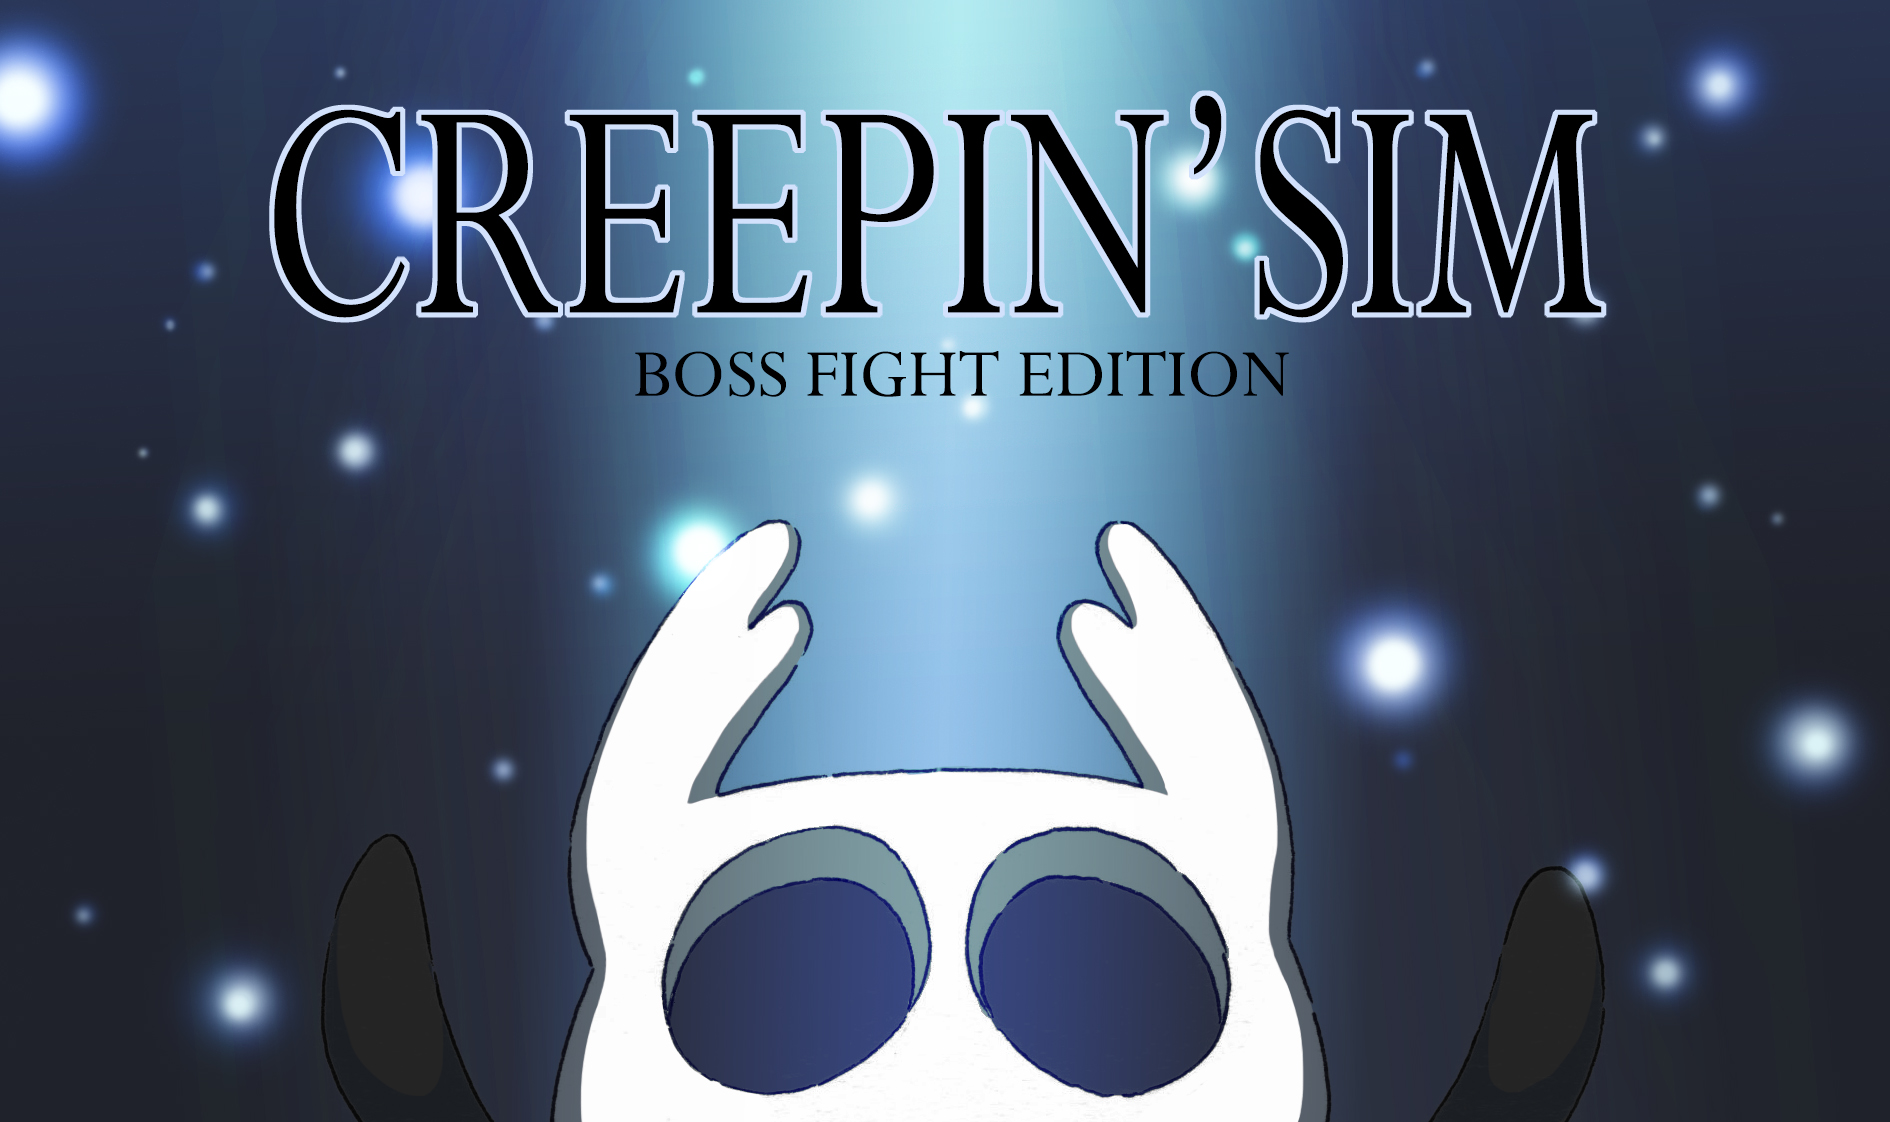 Creepin Sim - Boss Fight Edition